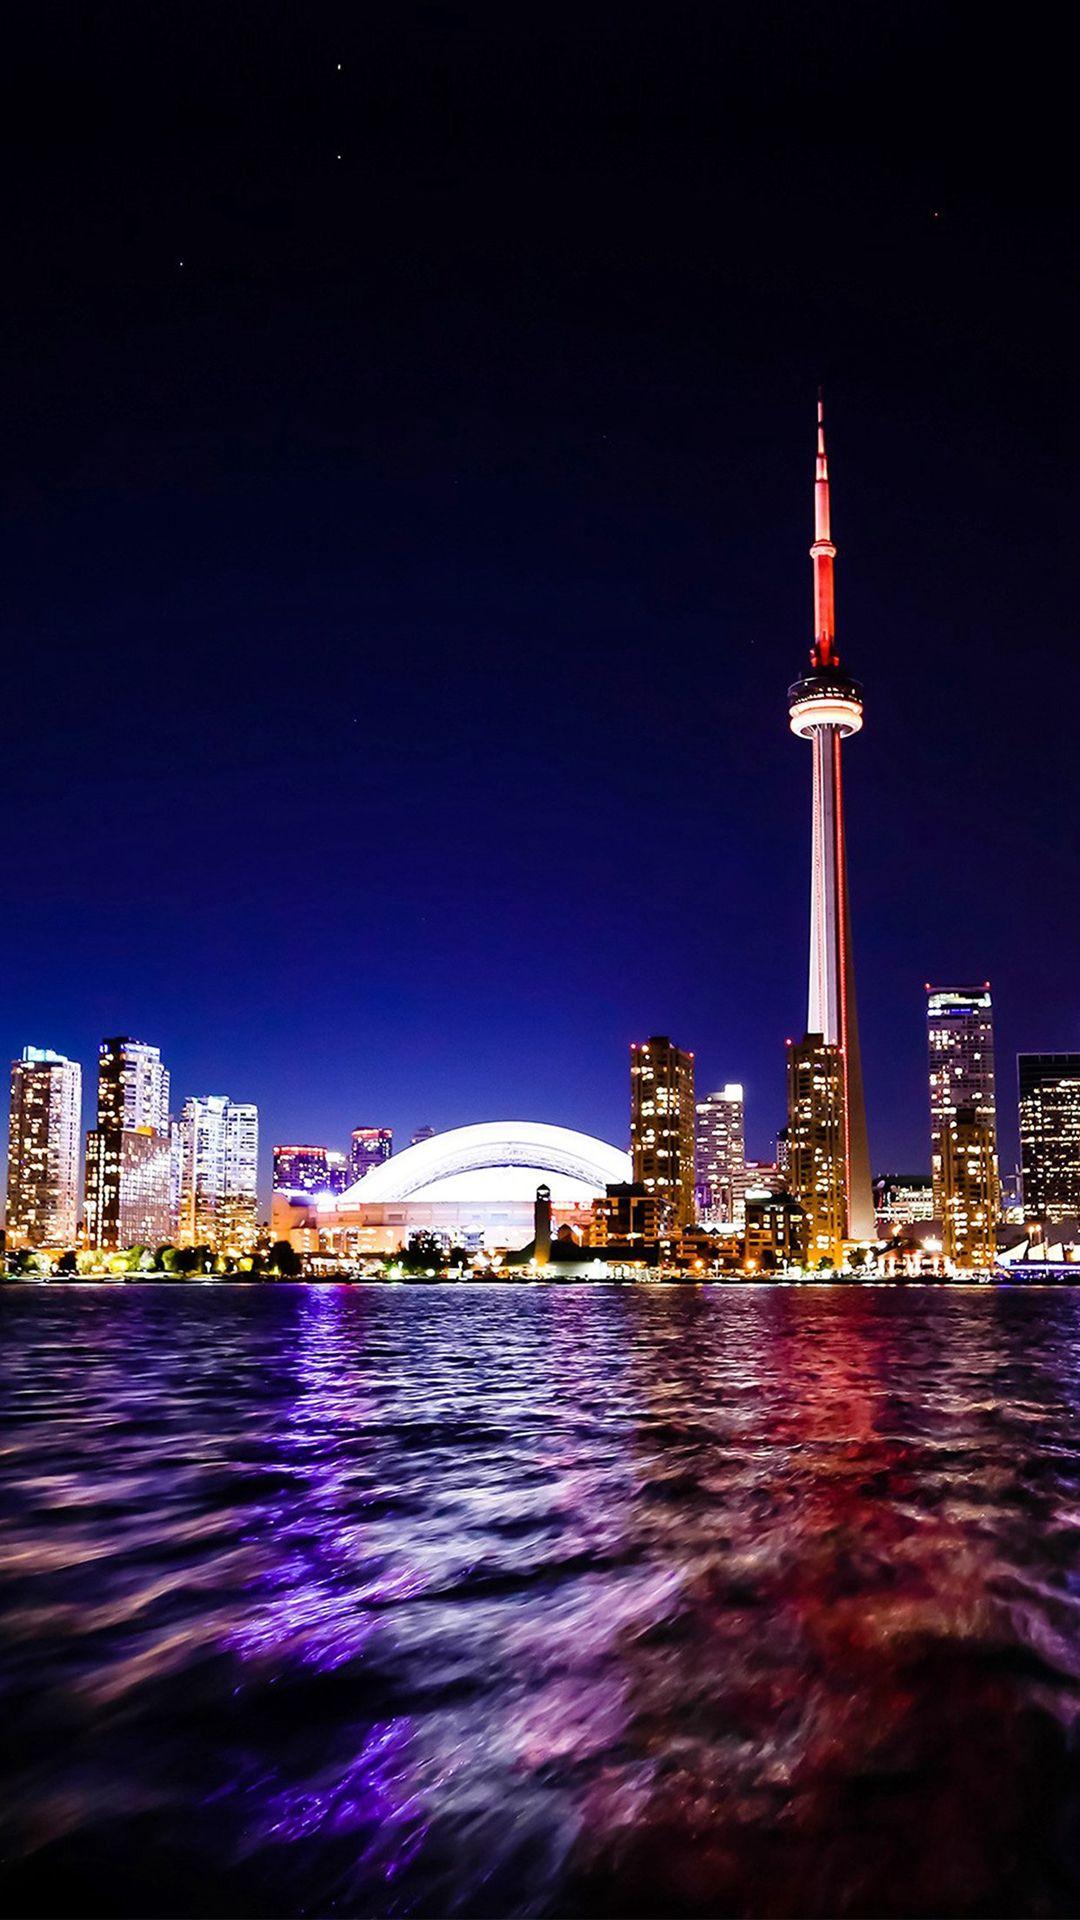 Toronto Lake Canada City Night View Iphone 7 Wallpaper Iphone 6